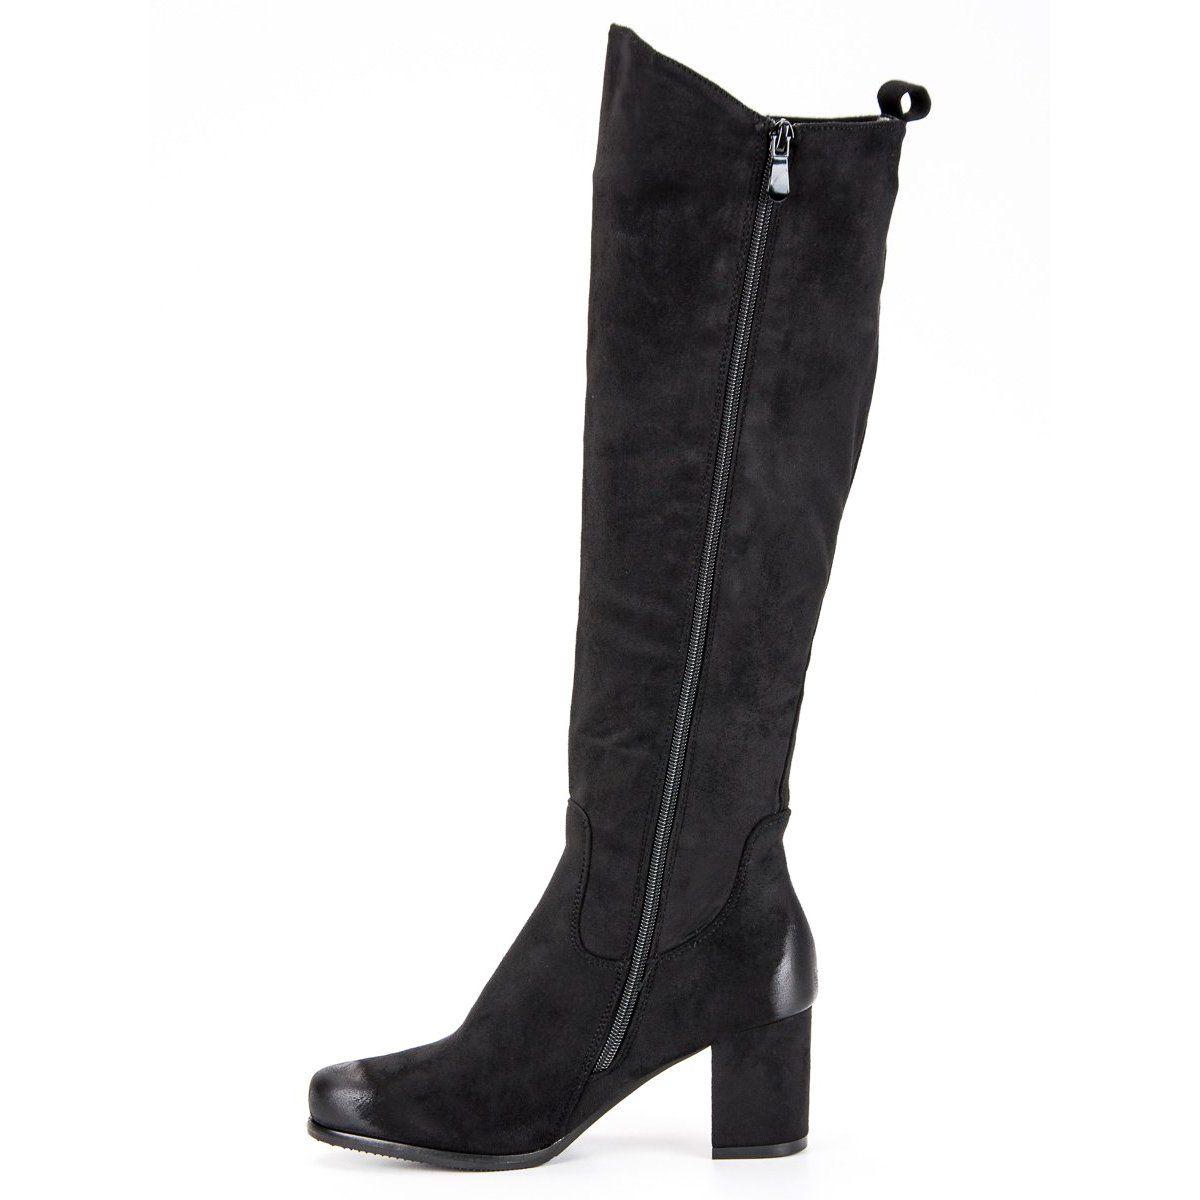 3f8622ef Czarne Wygodne Kozaki Na Obcasie VINCEZA | Kozaki damskie | Boots ...